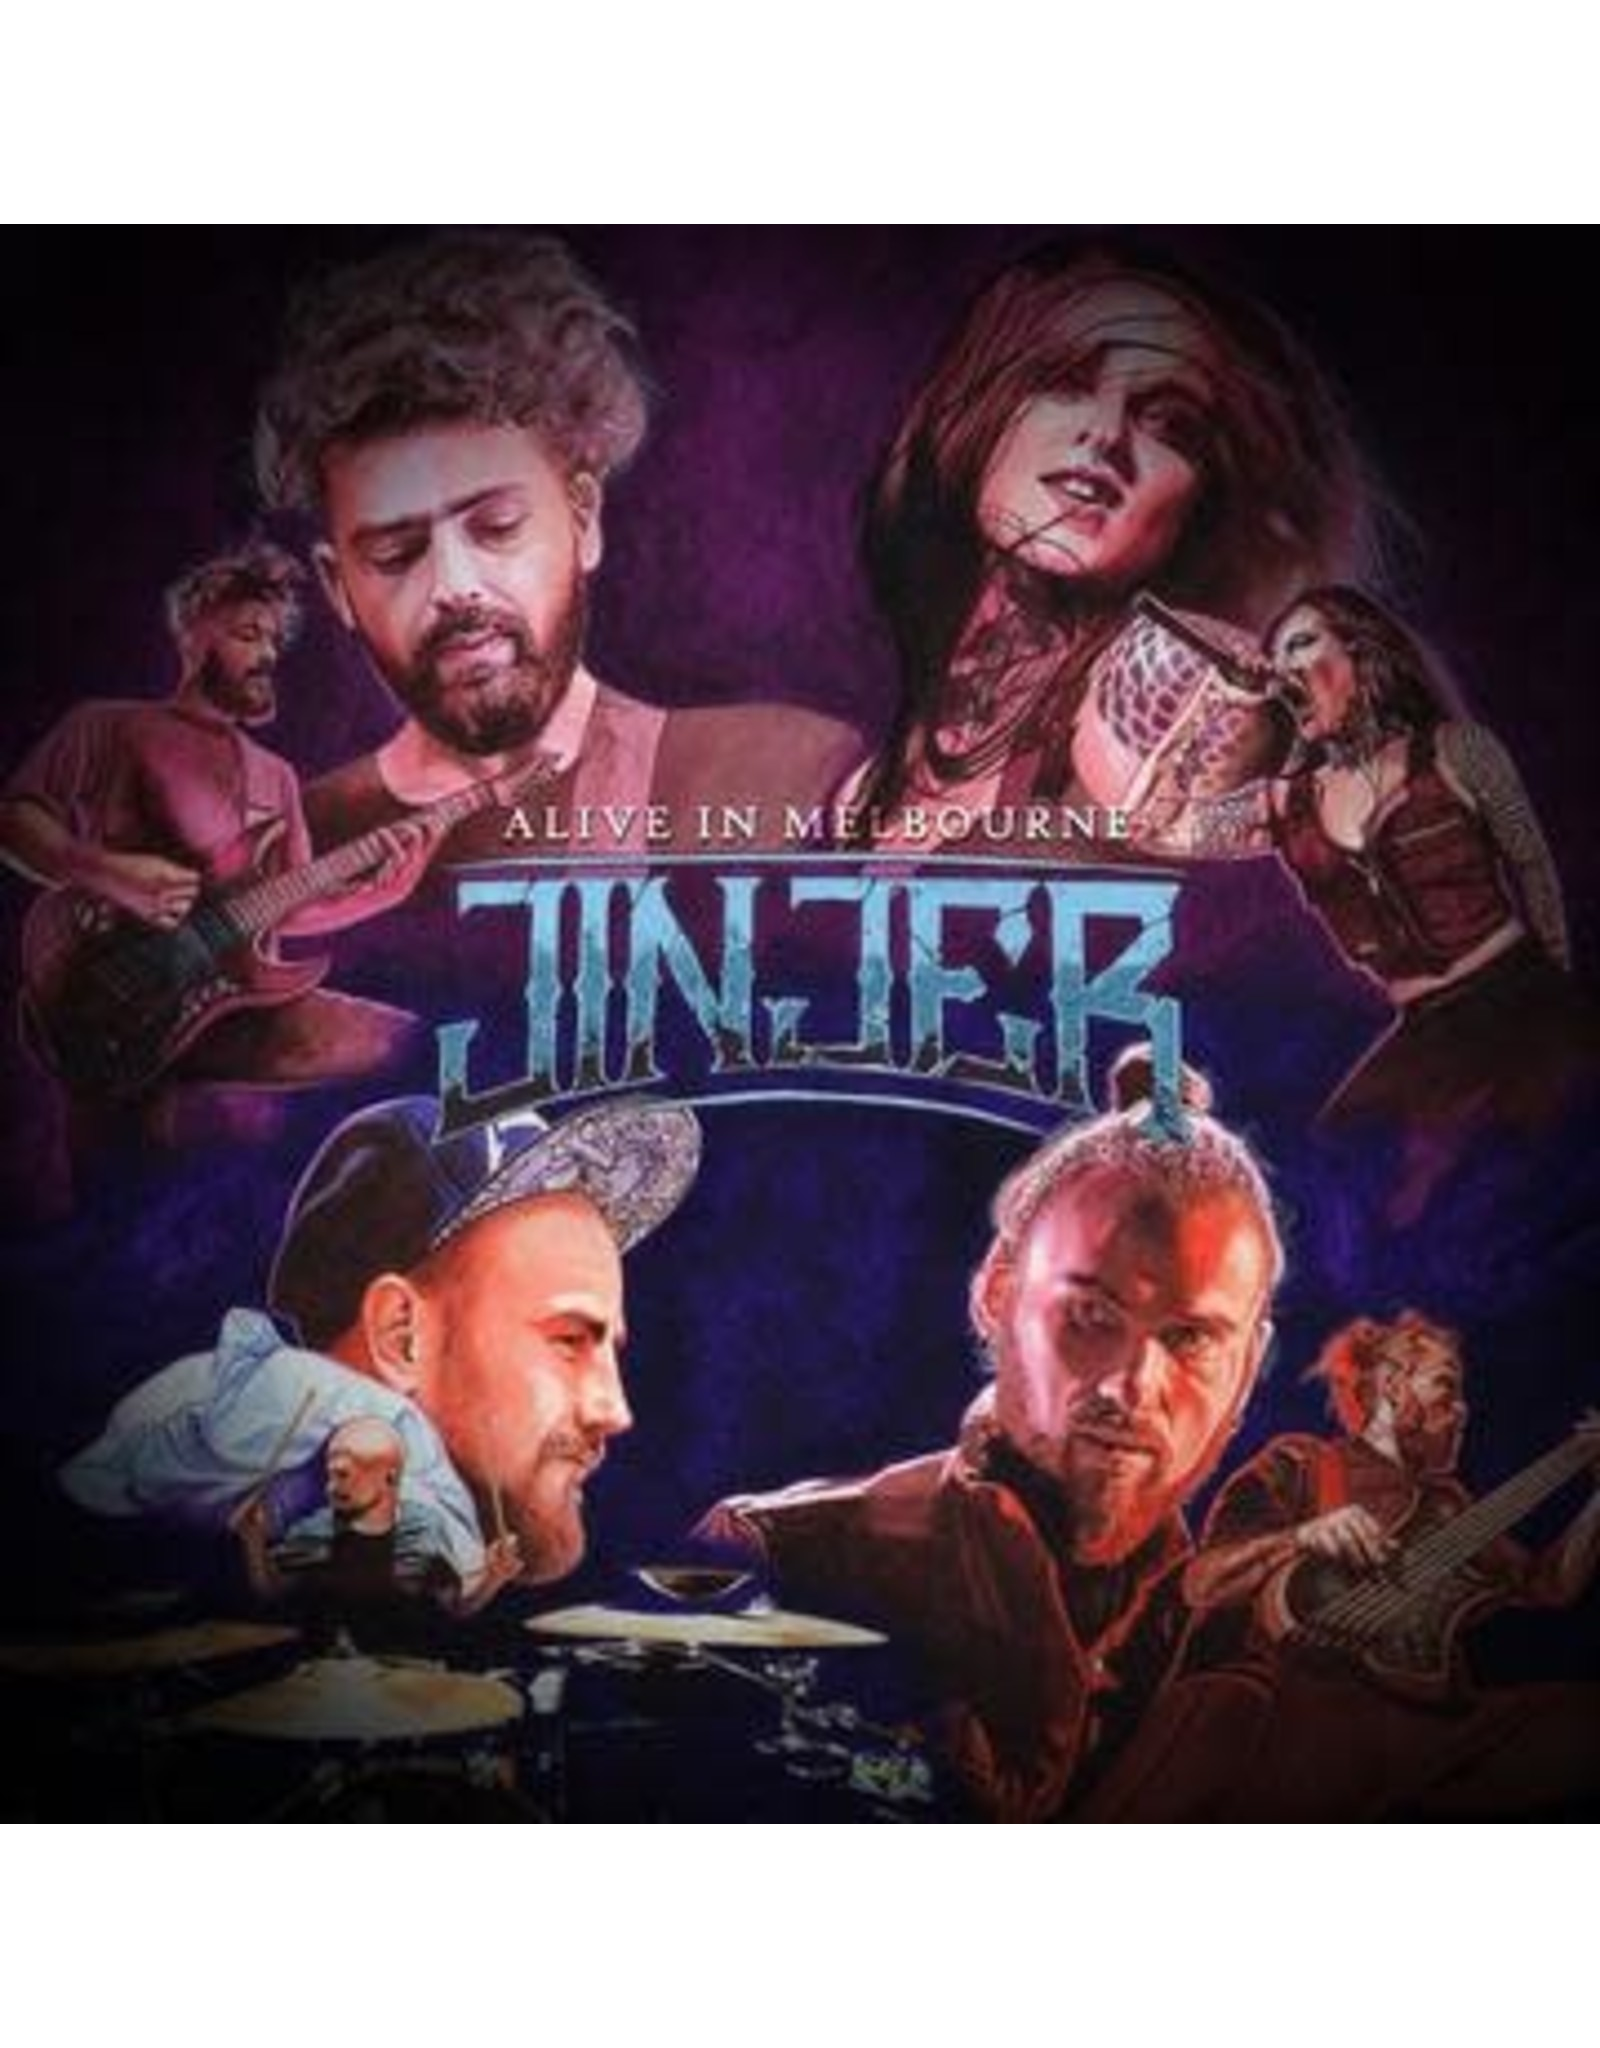 Jinjer - Alive In Melmourne 2LP